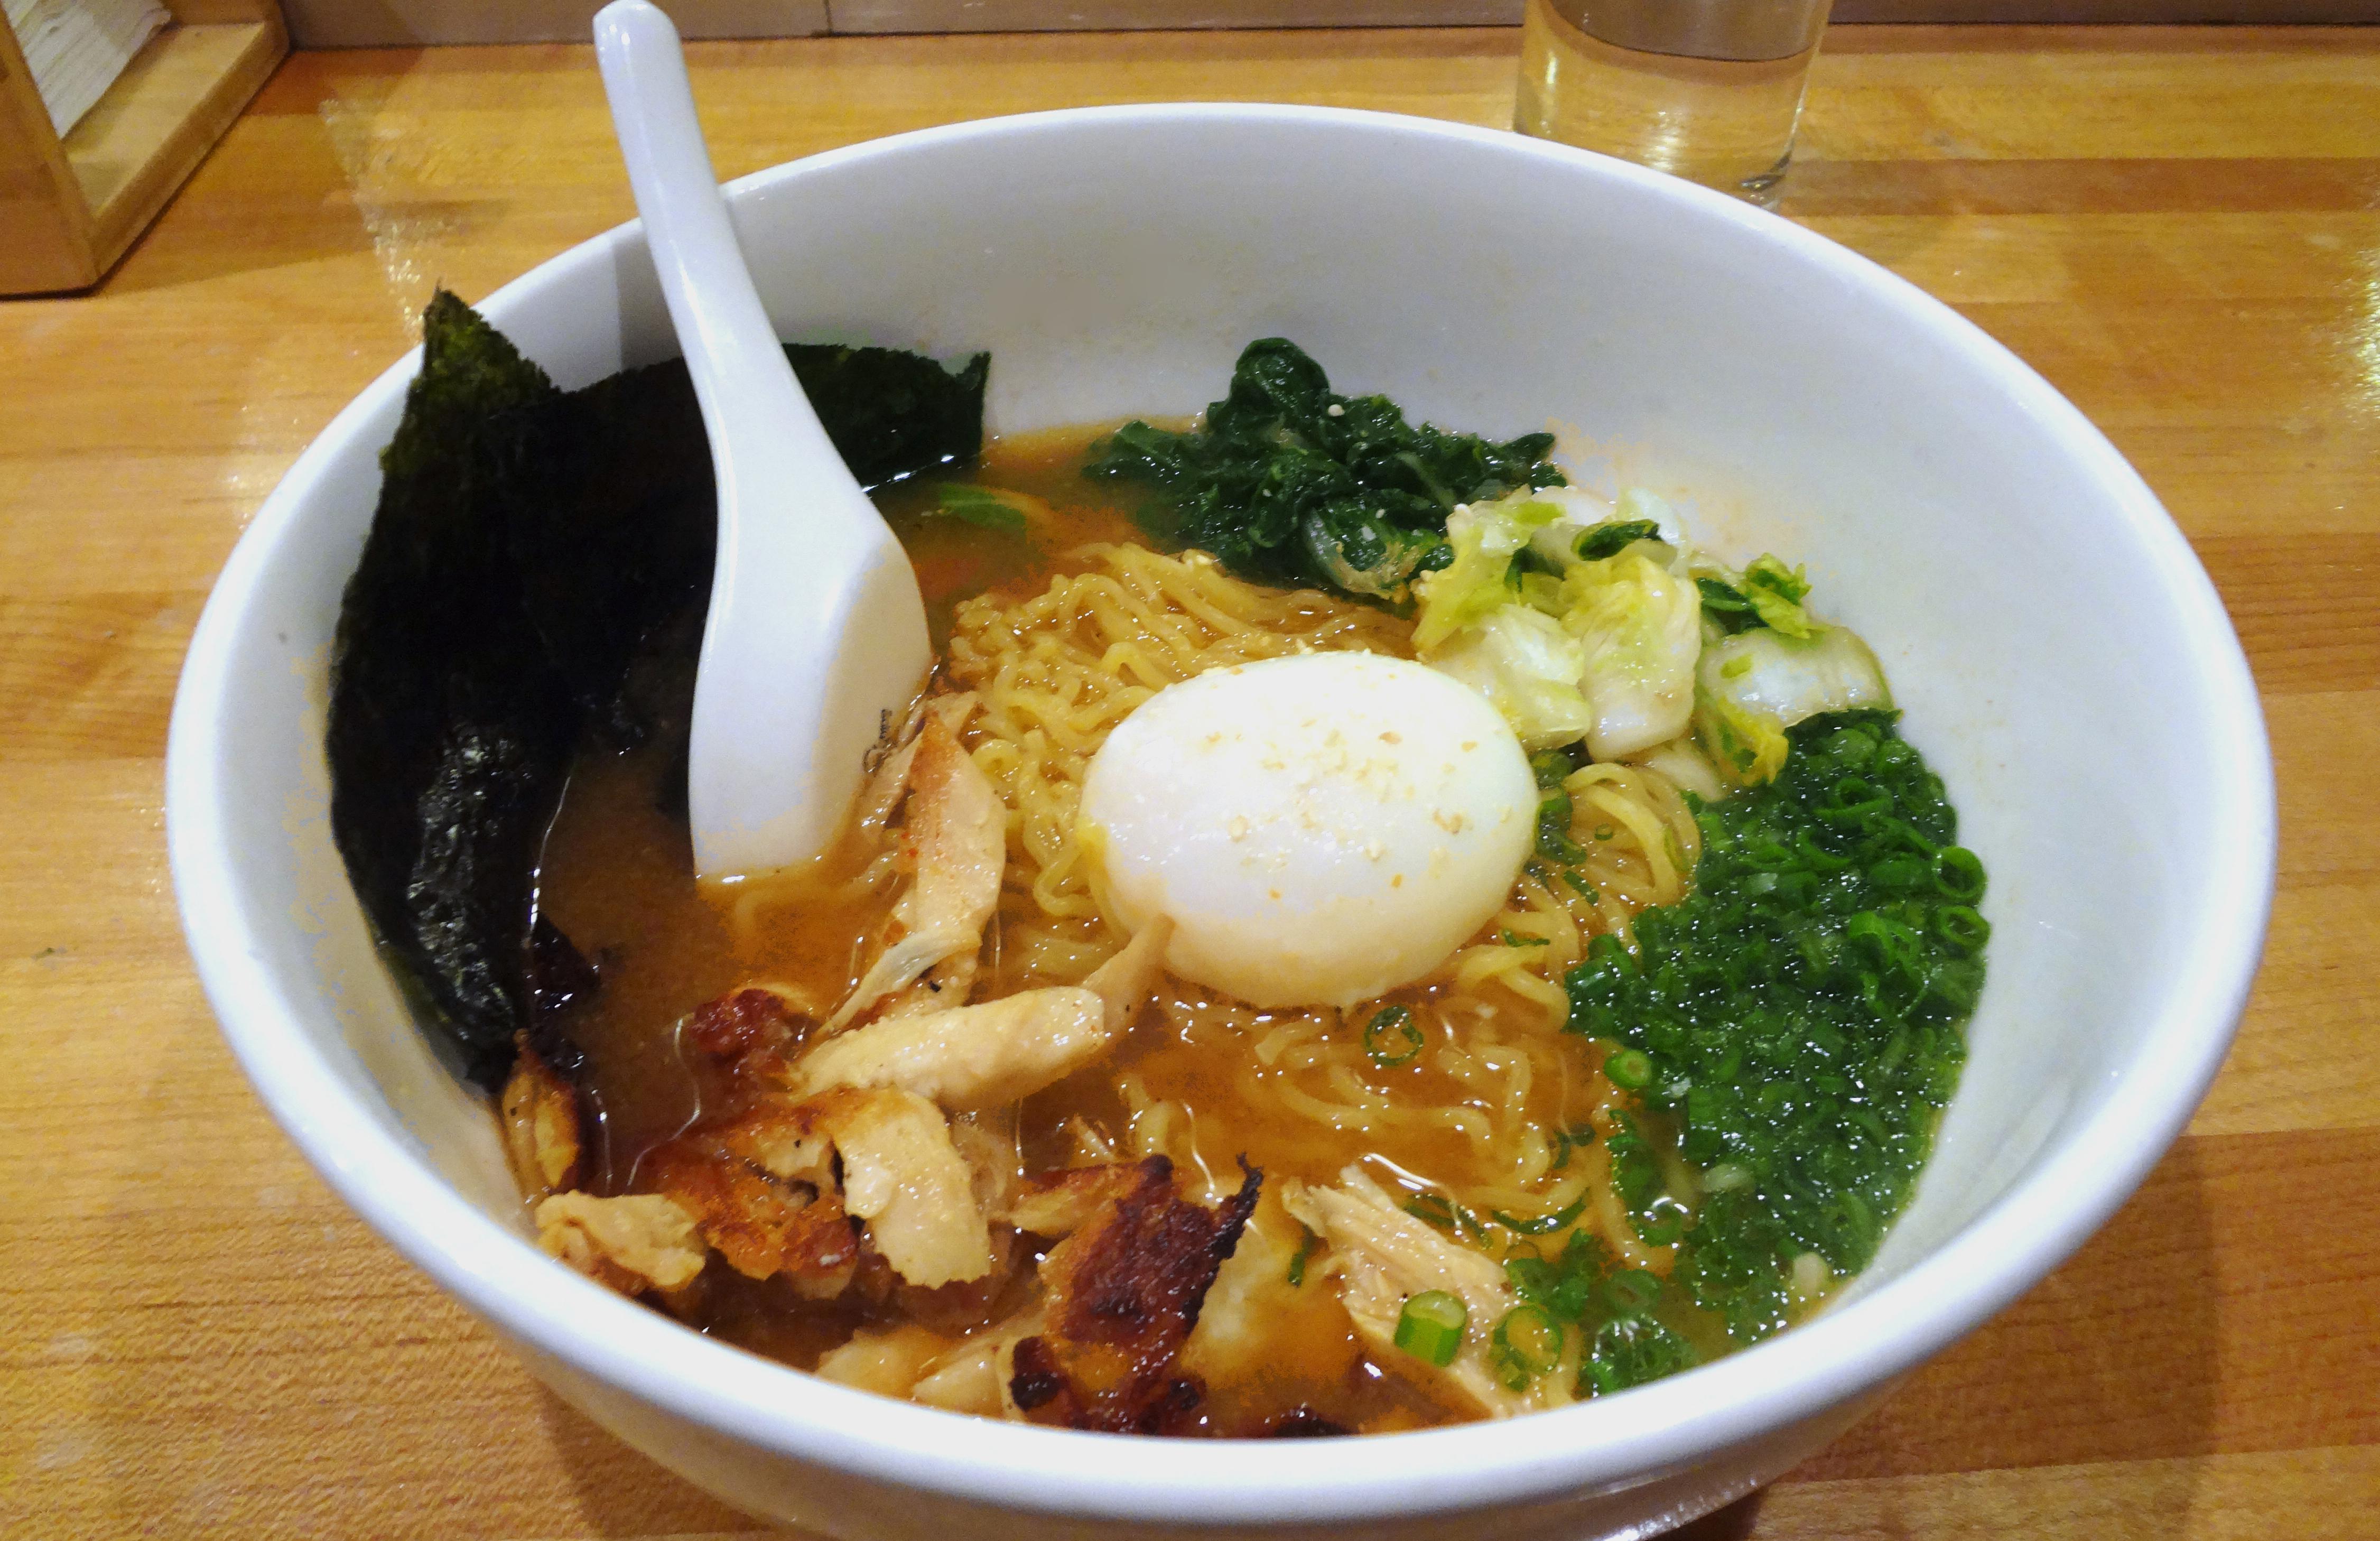 Momofuku ramen noode soup